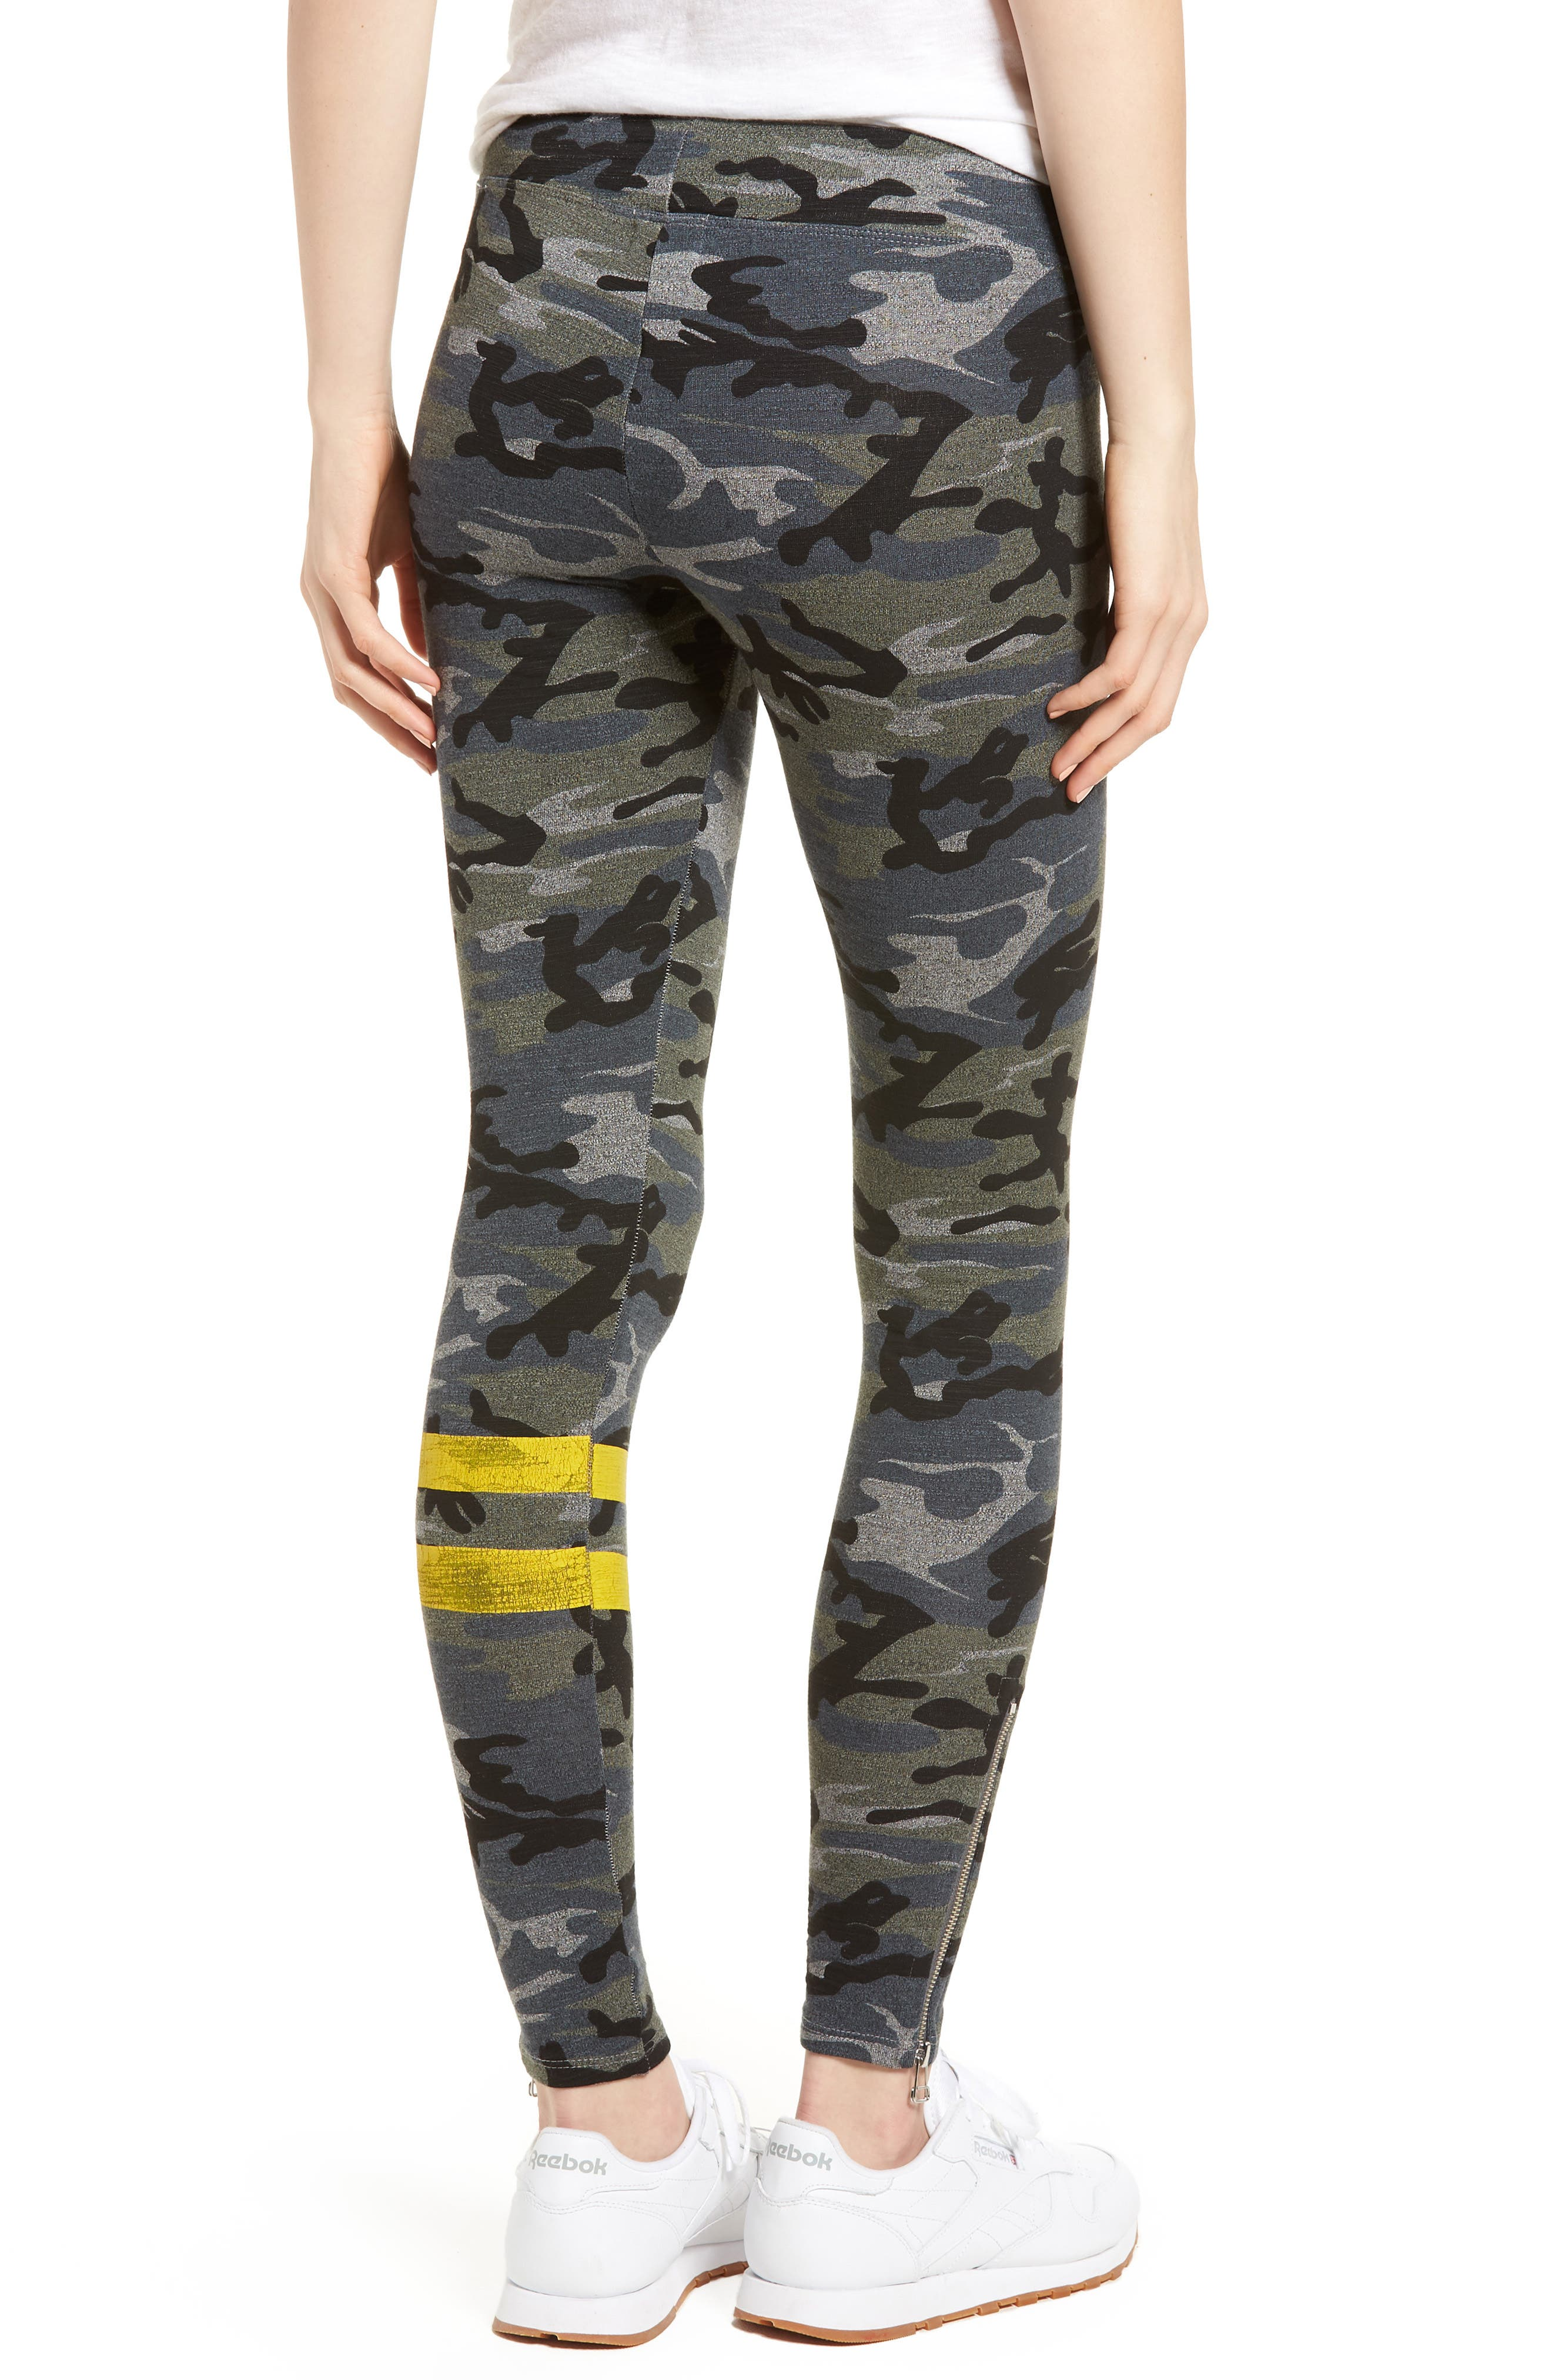 Stripe Camo Yoga Pants,                             Alternate thumbnail 2, color,